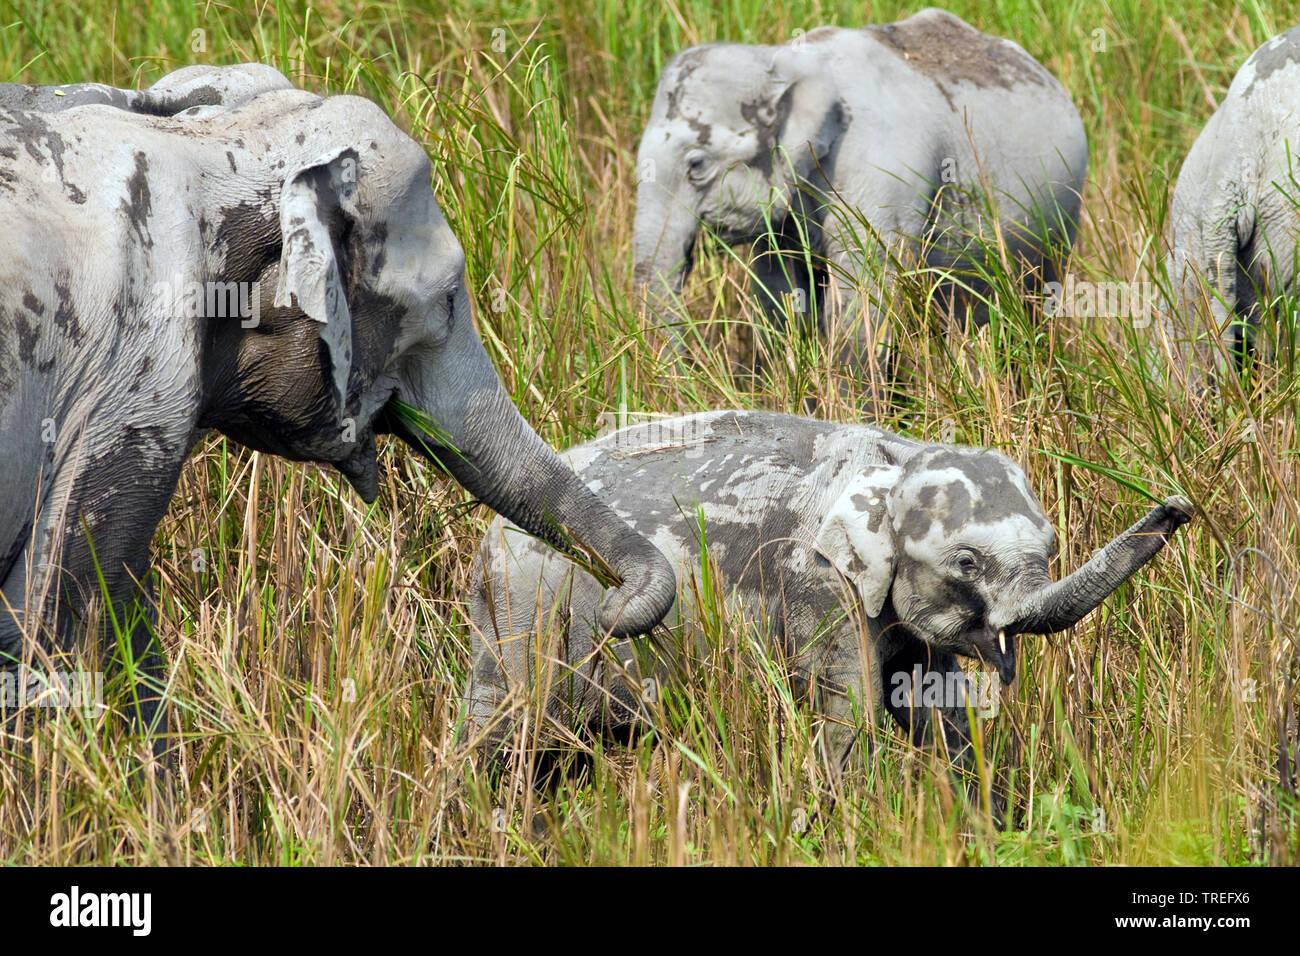 Indischer Elefant, Asiatischer Elefant (Elephas maximus indicus, Elephas maximus Bengalensis), Gruppe beim Fressen, Indien, Kaziranga Nationalpark | I Stockbild